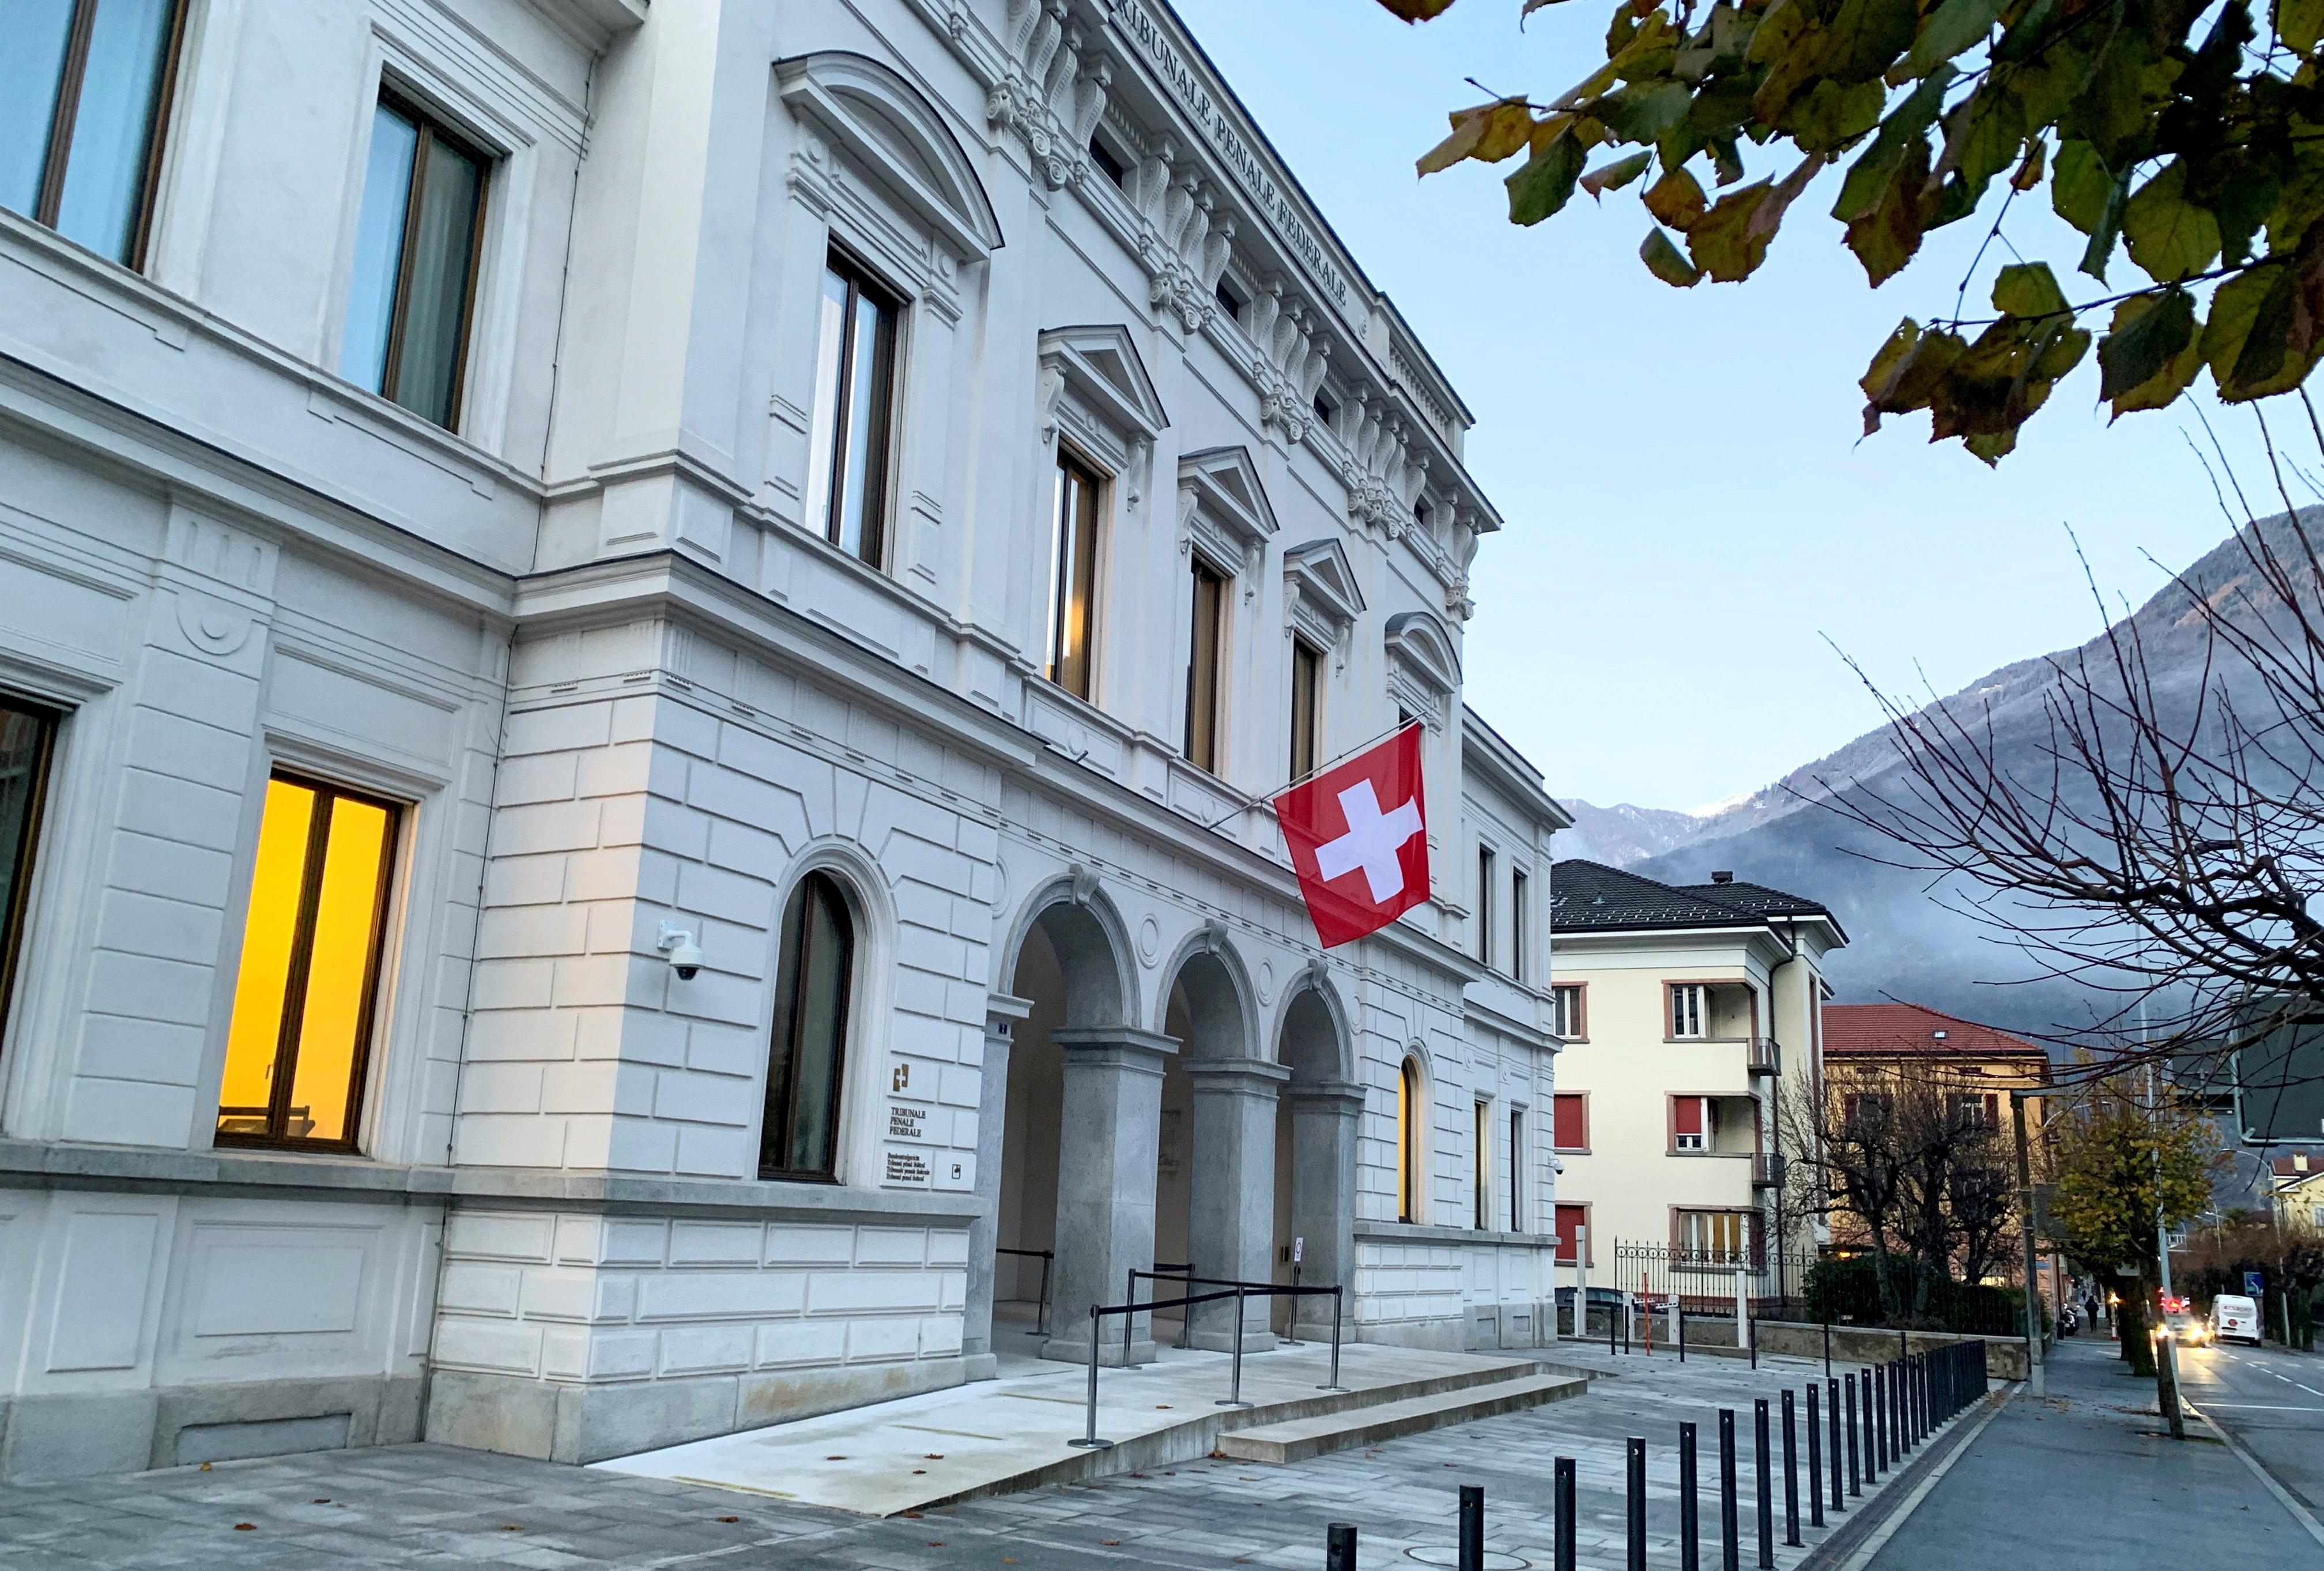 Switzerland's national flag is displayed on the Swiss Federal Criminal Court (Bundesstrafgericht) building in Bellinzona, Switzerland.  REUTERS/Emma Farge